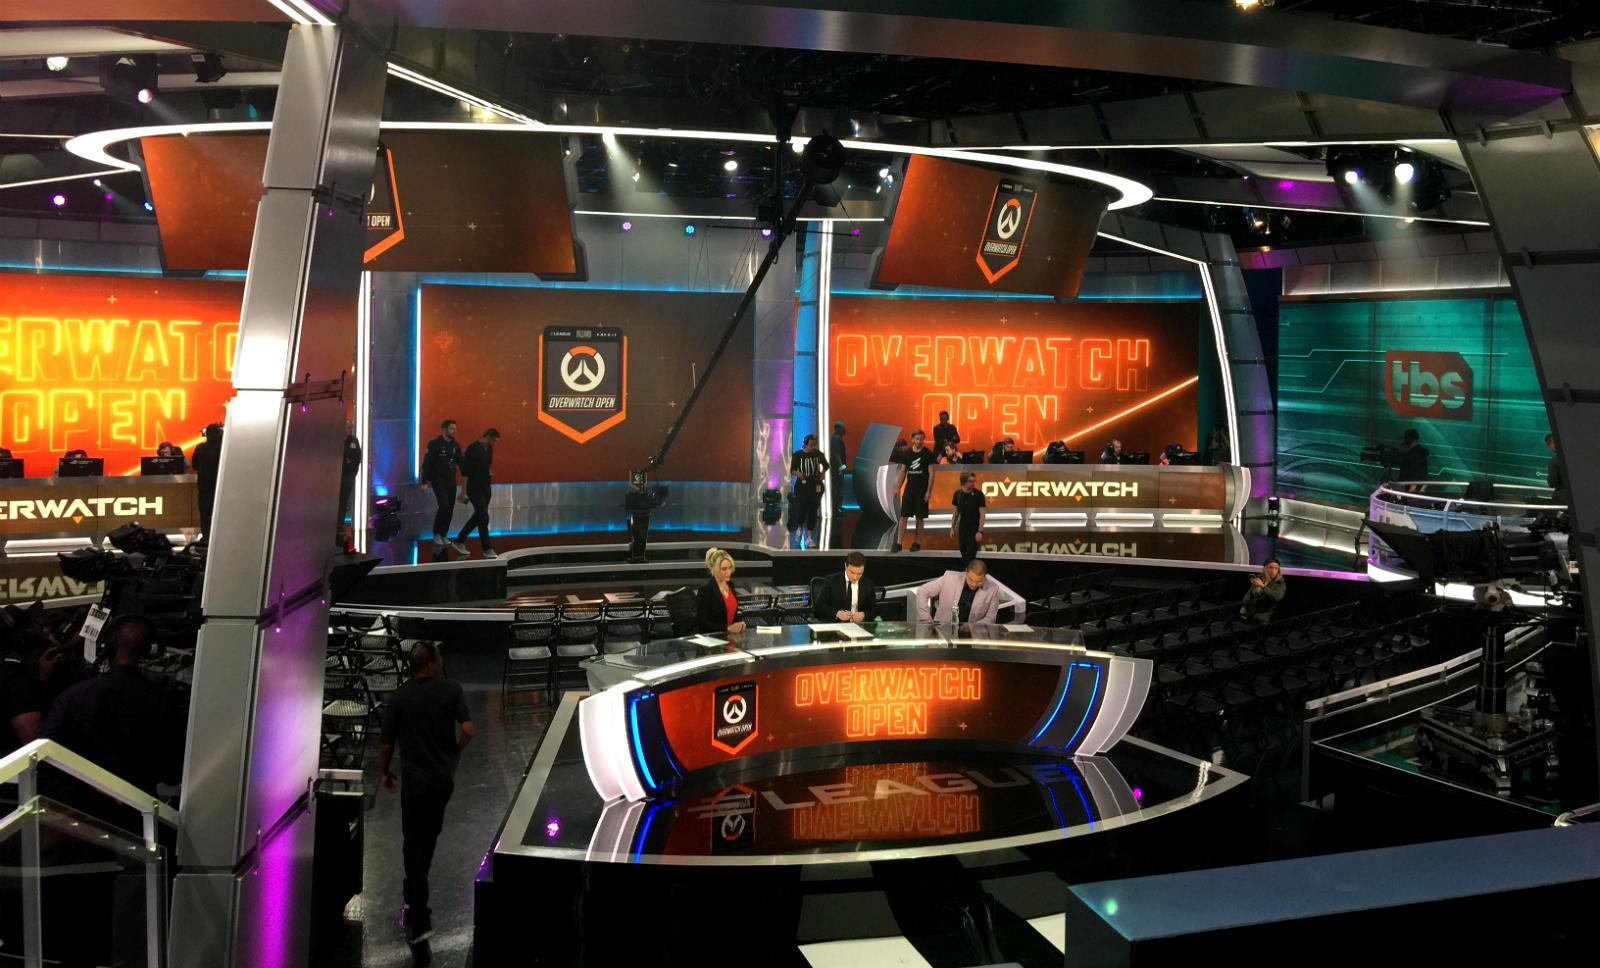 Blizzard launches an 'Overwatch' league for amateurs